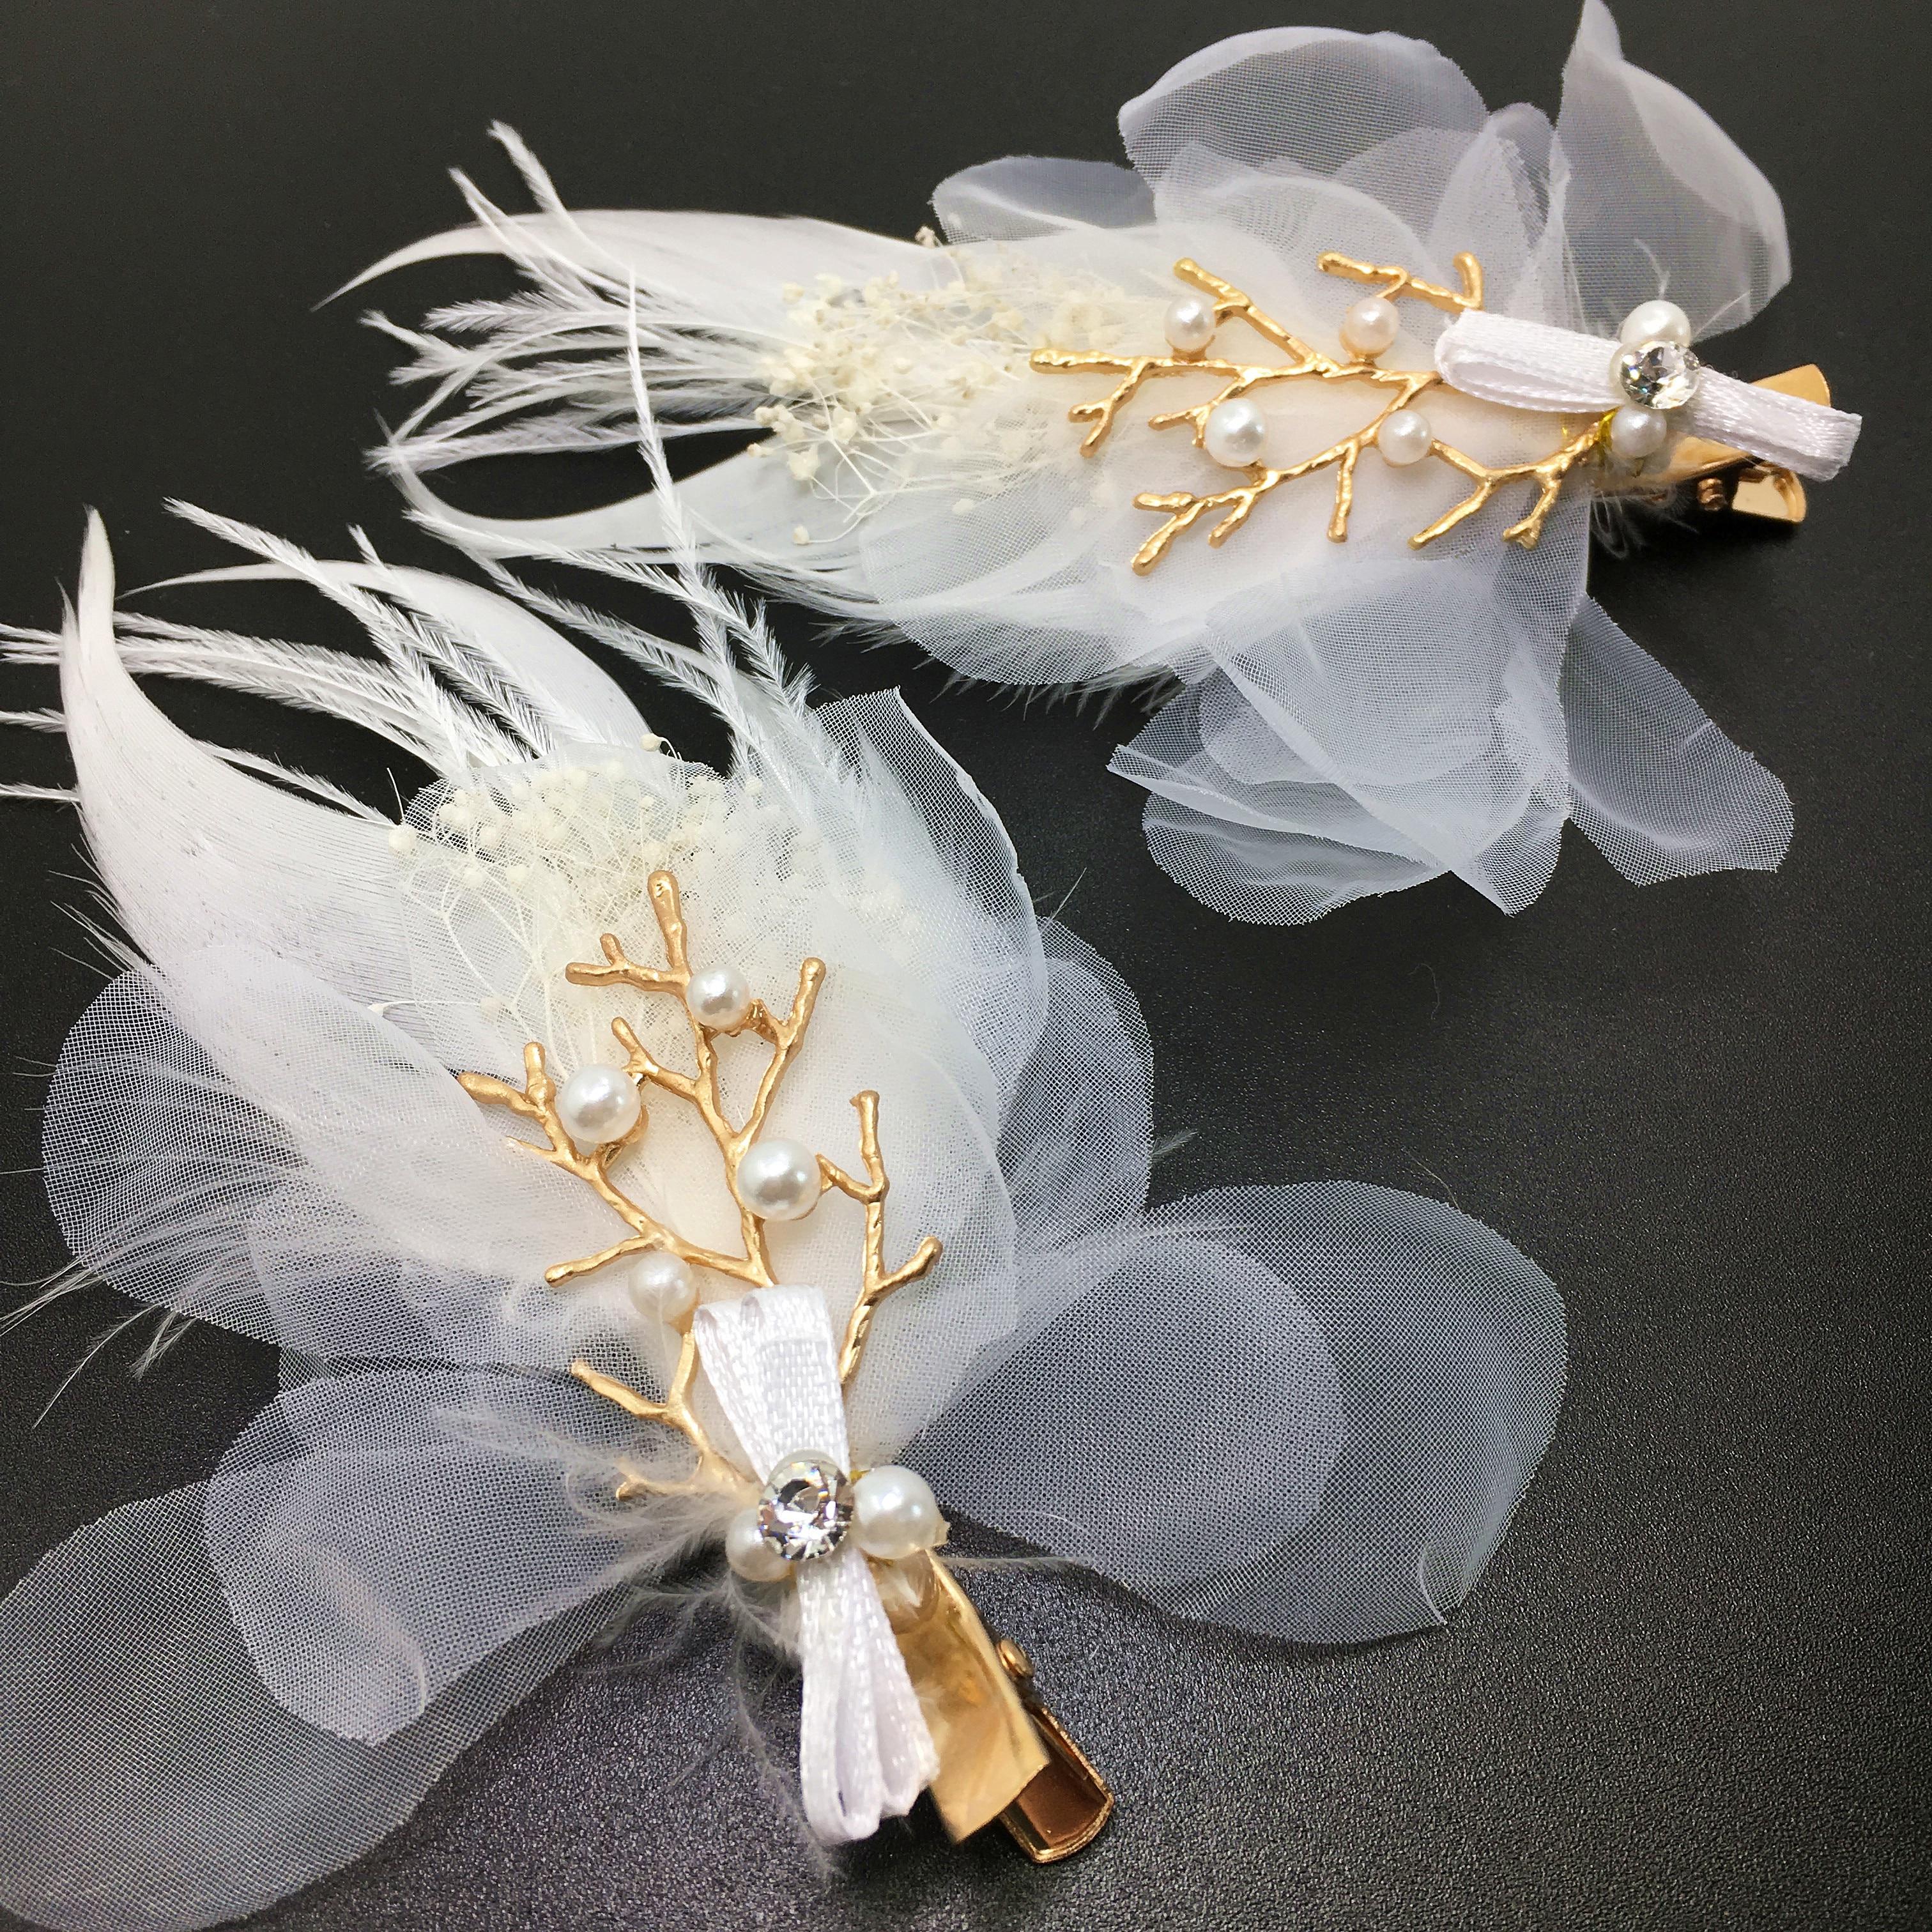 us $11.23 27% off|set of 2 feather hair clip fabric flower pins wedding hair accessories bride headpiece jewelry pince bijoux cheveux wigo1025-in hair